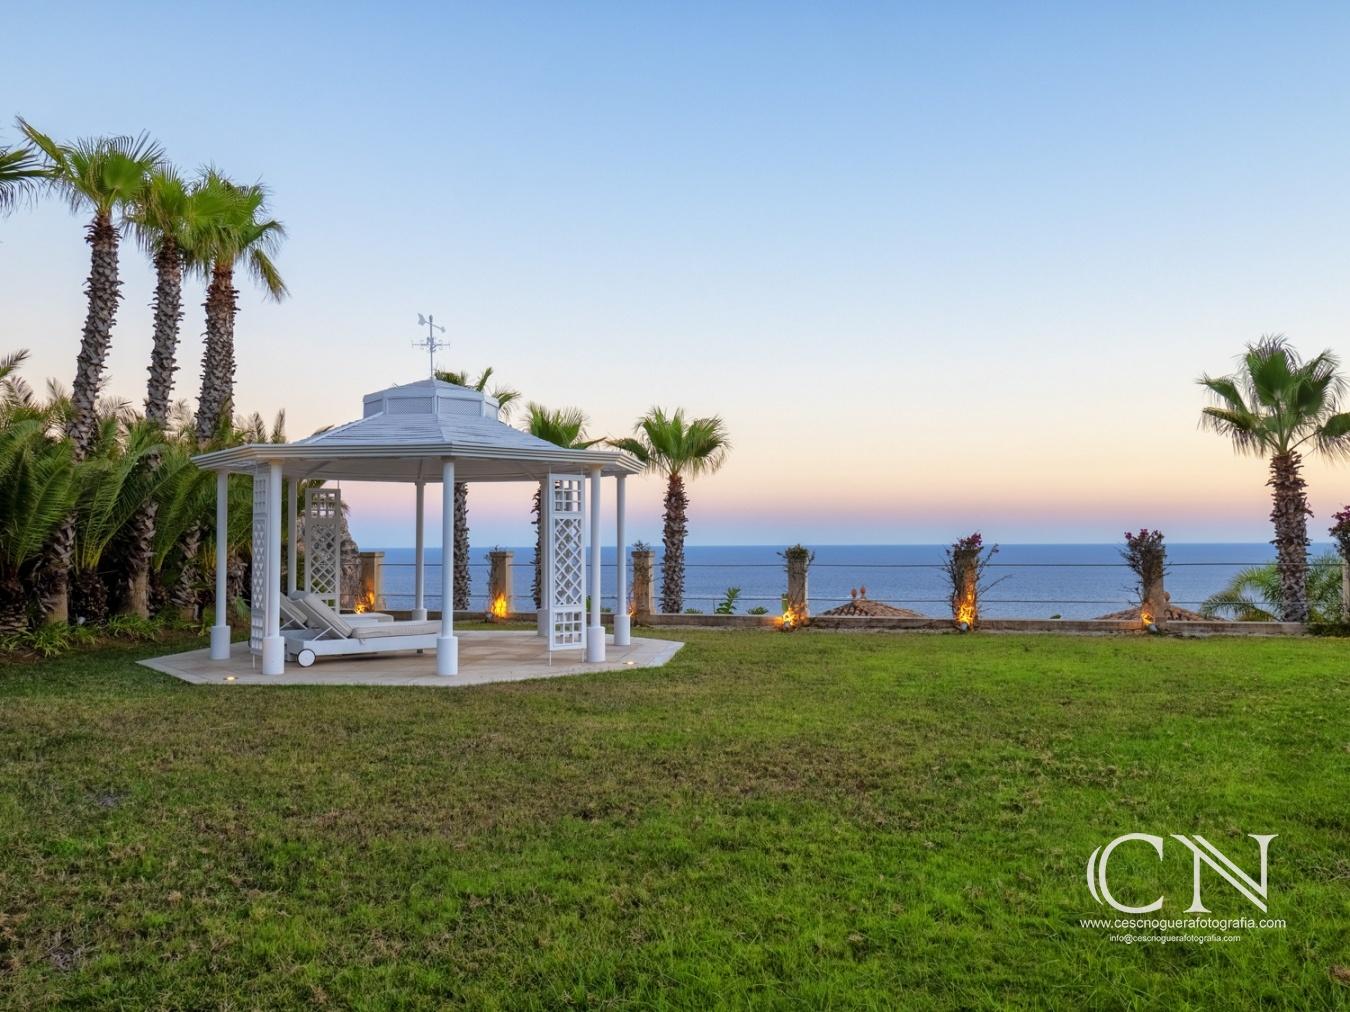 Finca a las Brisas - Cesc Noguera Fotografia,  Architectural & Interior design photographer / Landscape Photography.